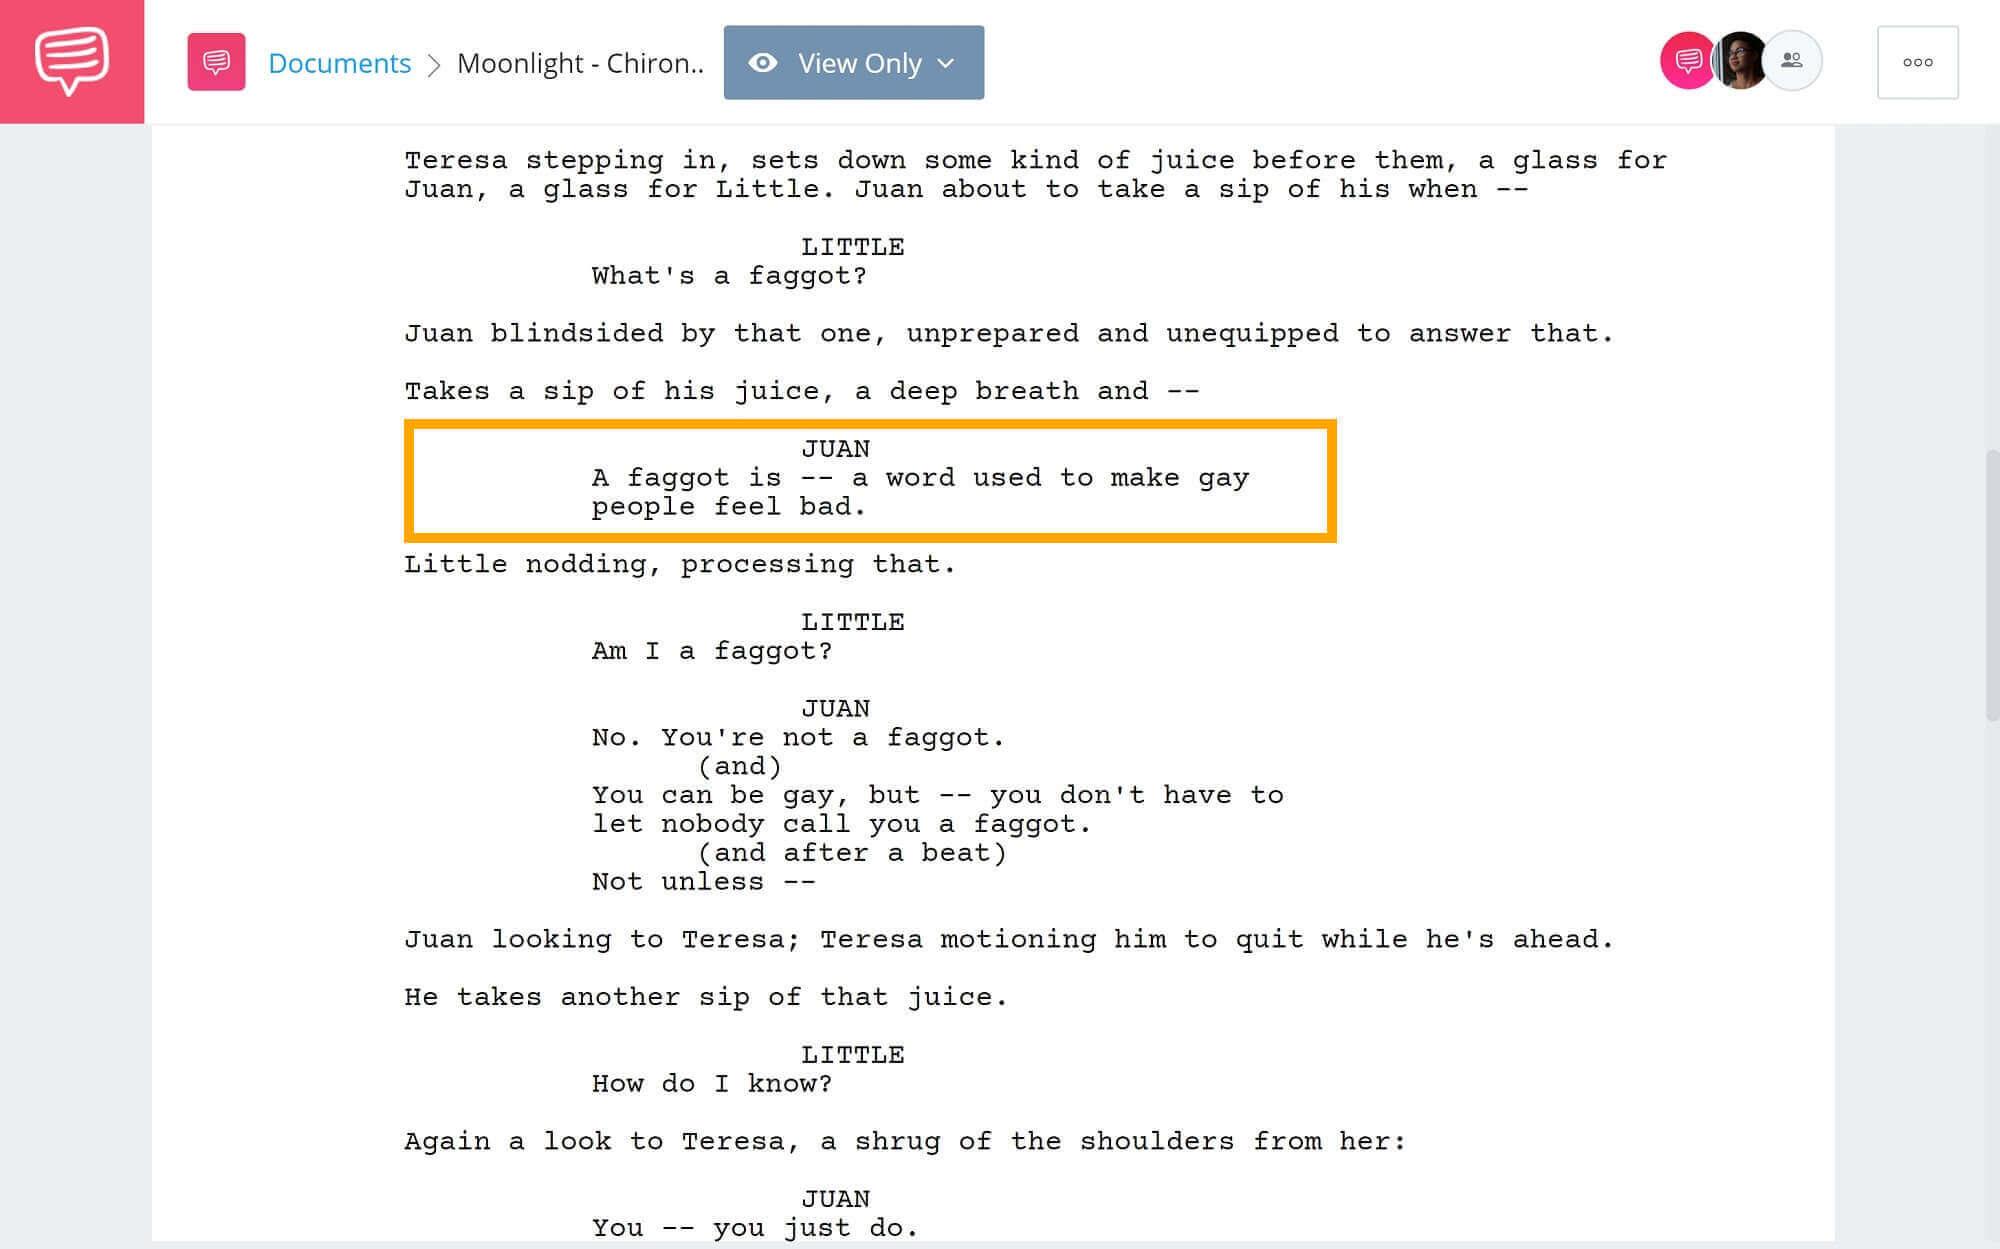 Moonlight-Script-Teardown-Chiron-and-Juans-Conversation-StudioBinder-Screenwriting-Software-2